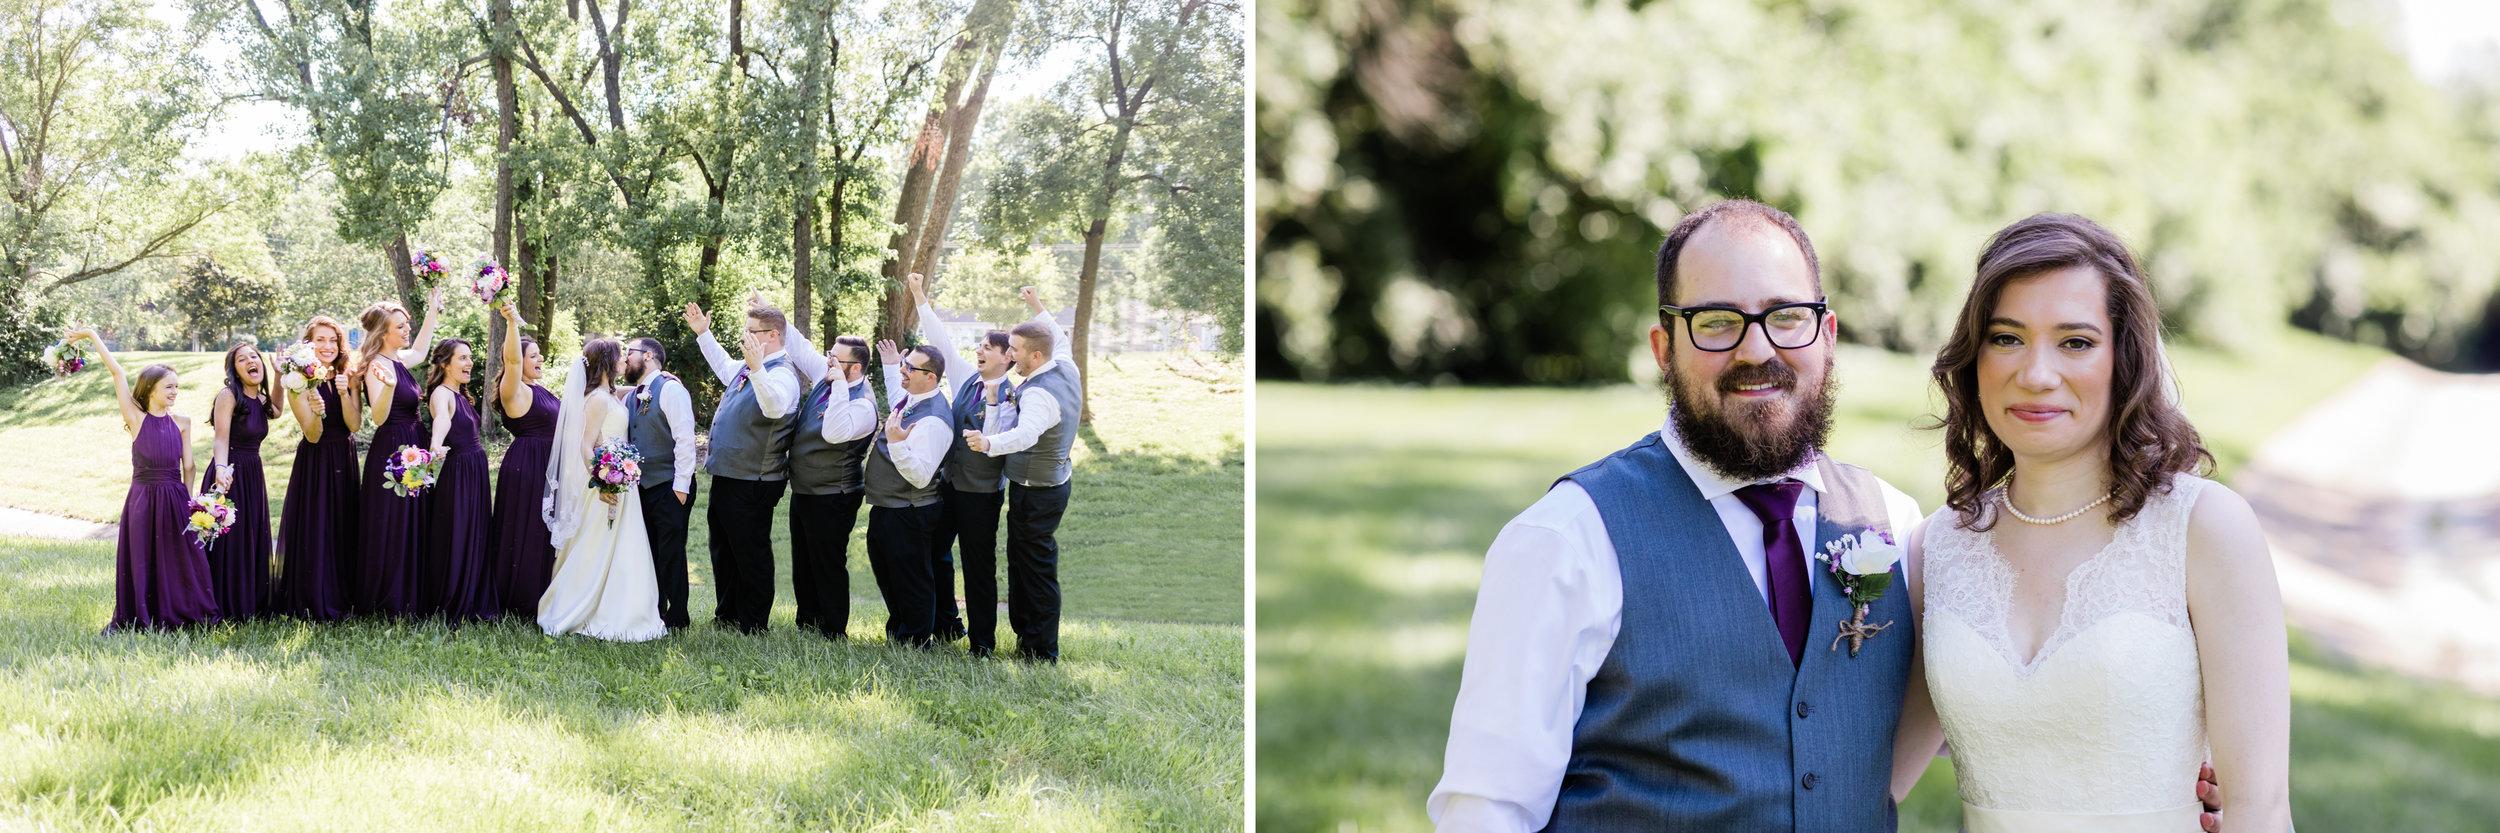 kansas city wedding photographer 21.jpg